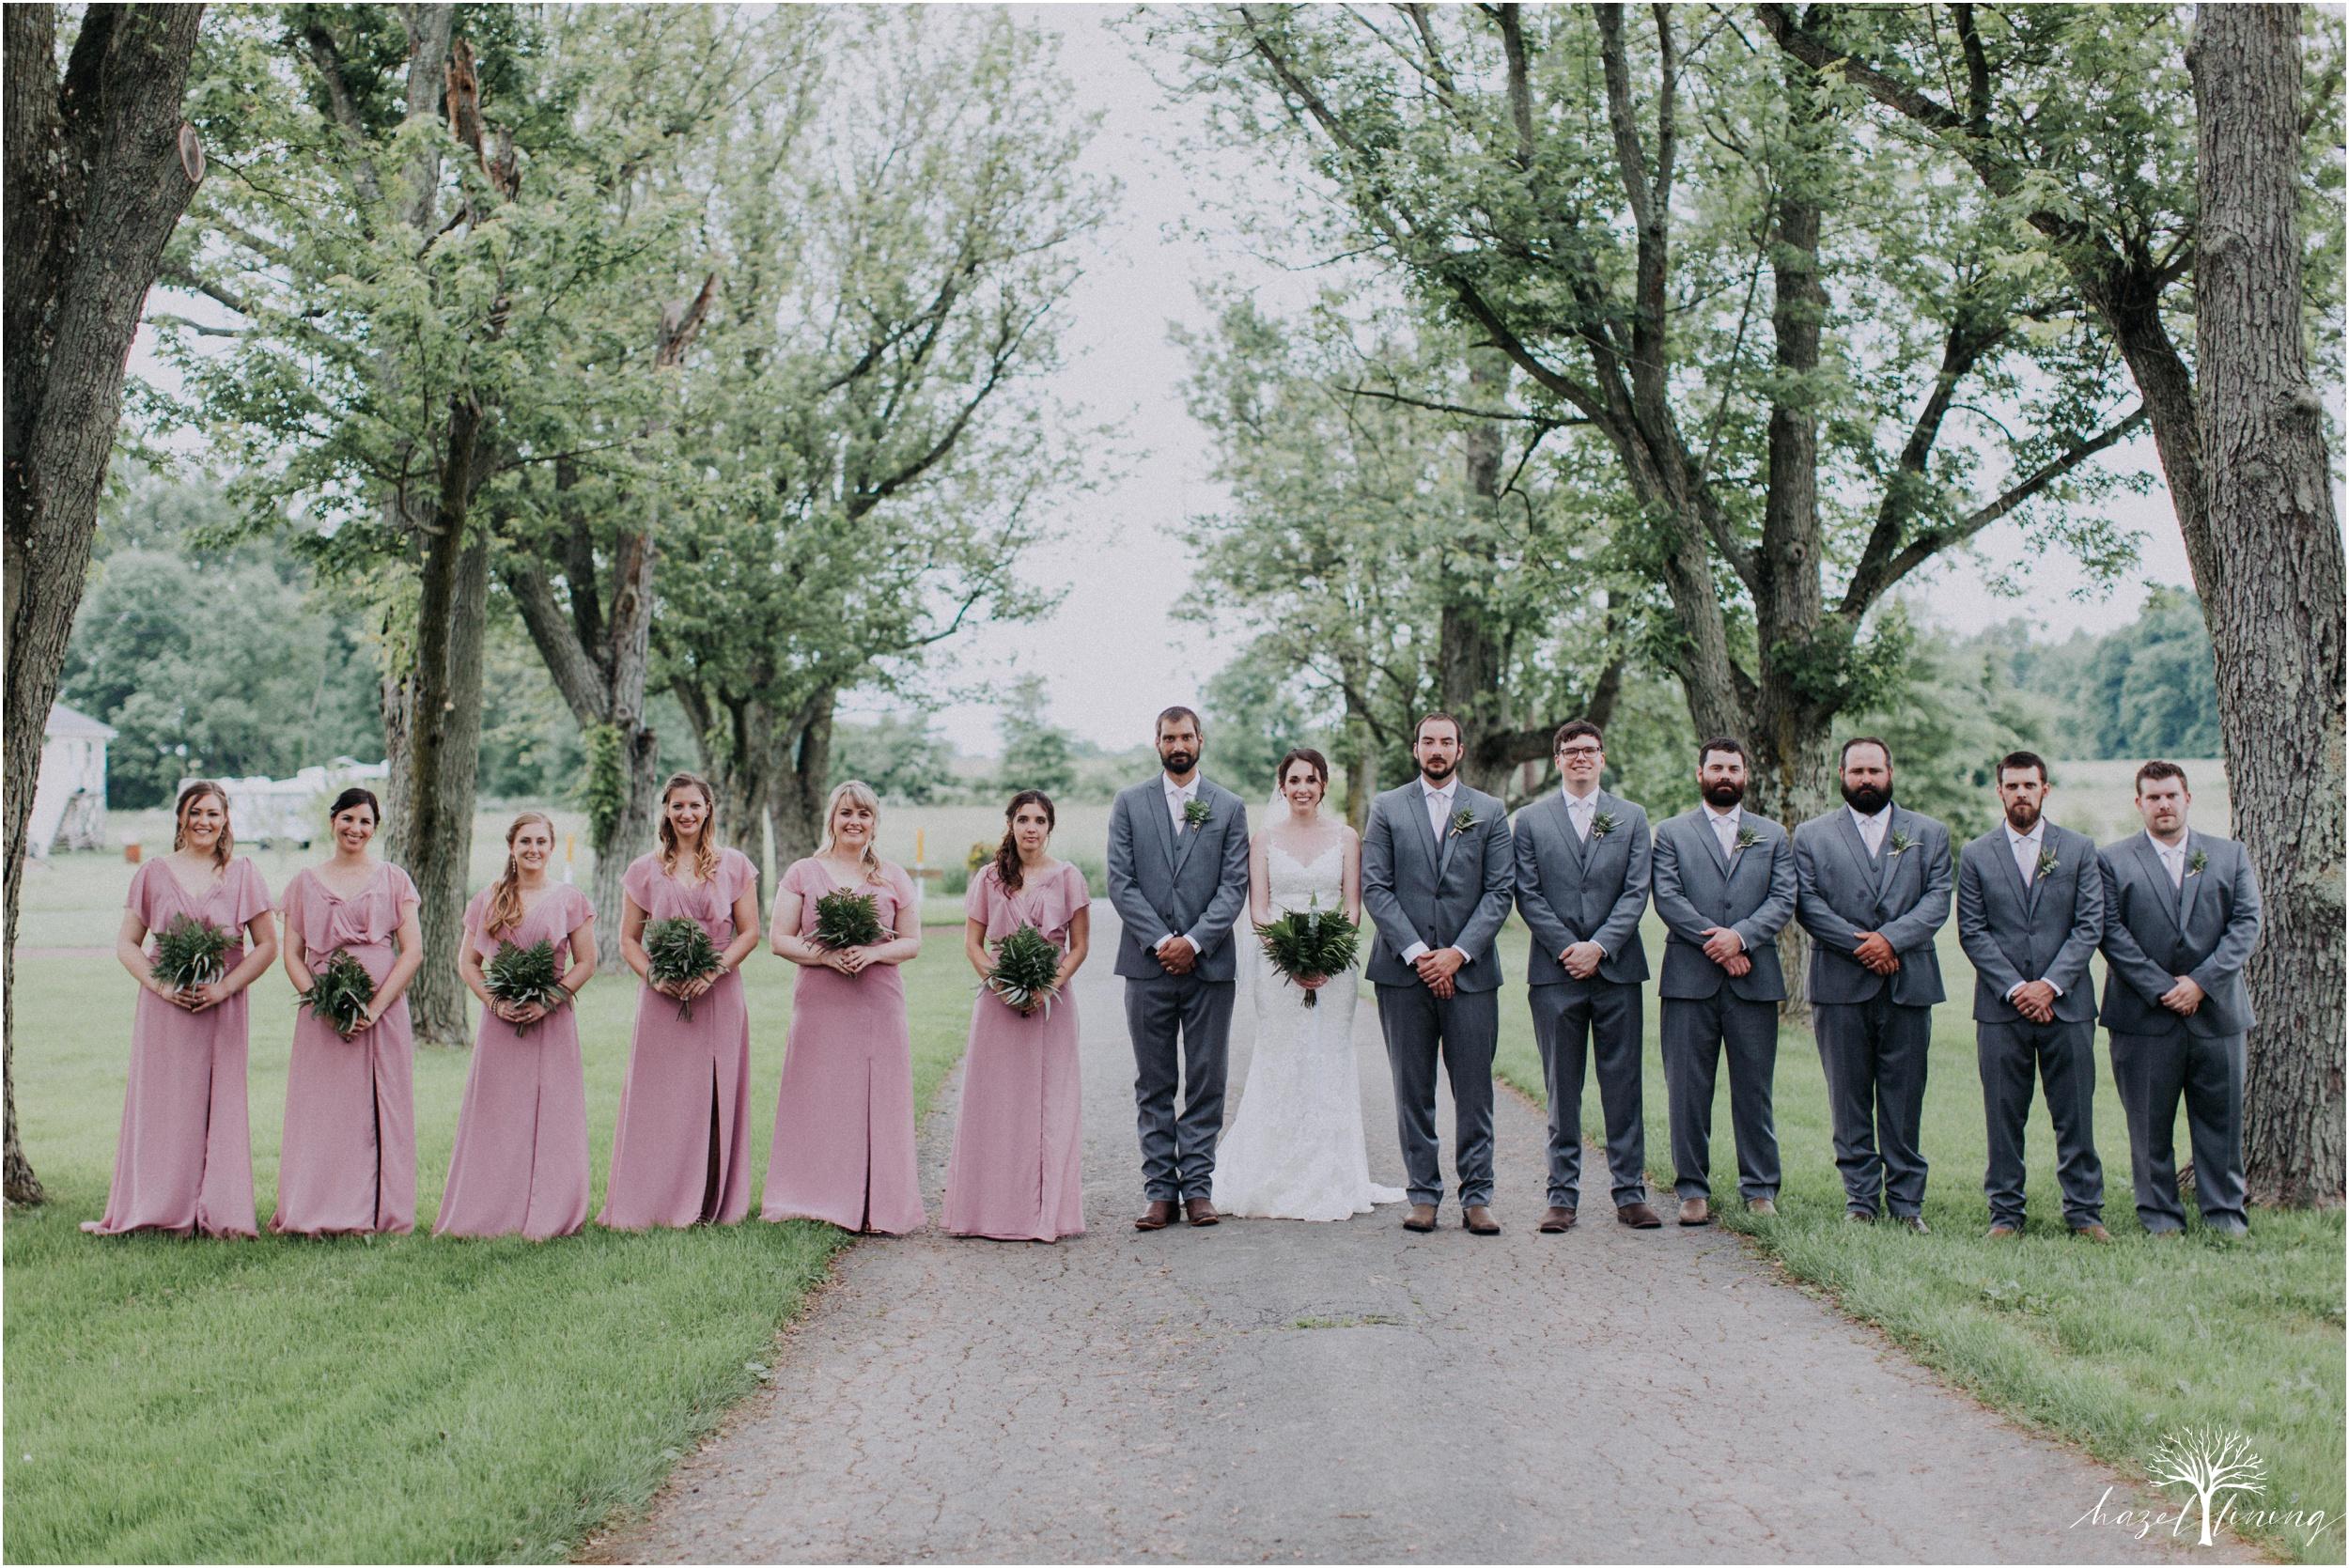 hazel-lining-travel-wedding-elopement-photography-lisa-landon-shoemaker-the-farm-bakery-and-events-bucks-county-quakertown-pennsylvania-summer-country-outdoor-farm-wedding_0070.jpg